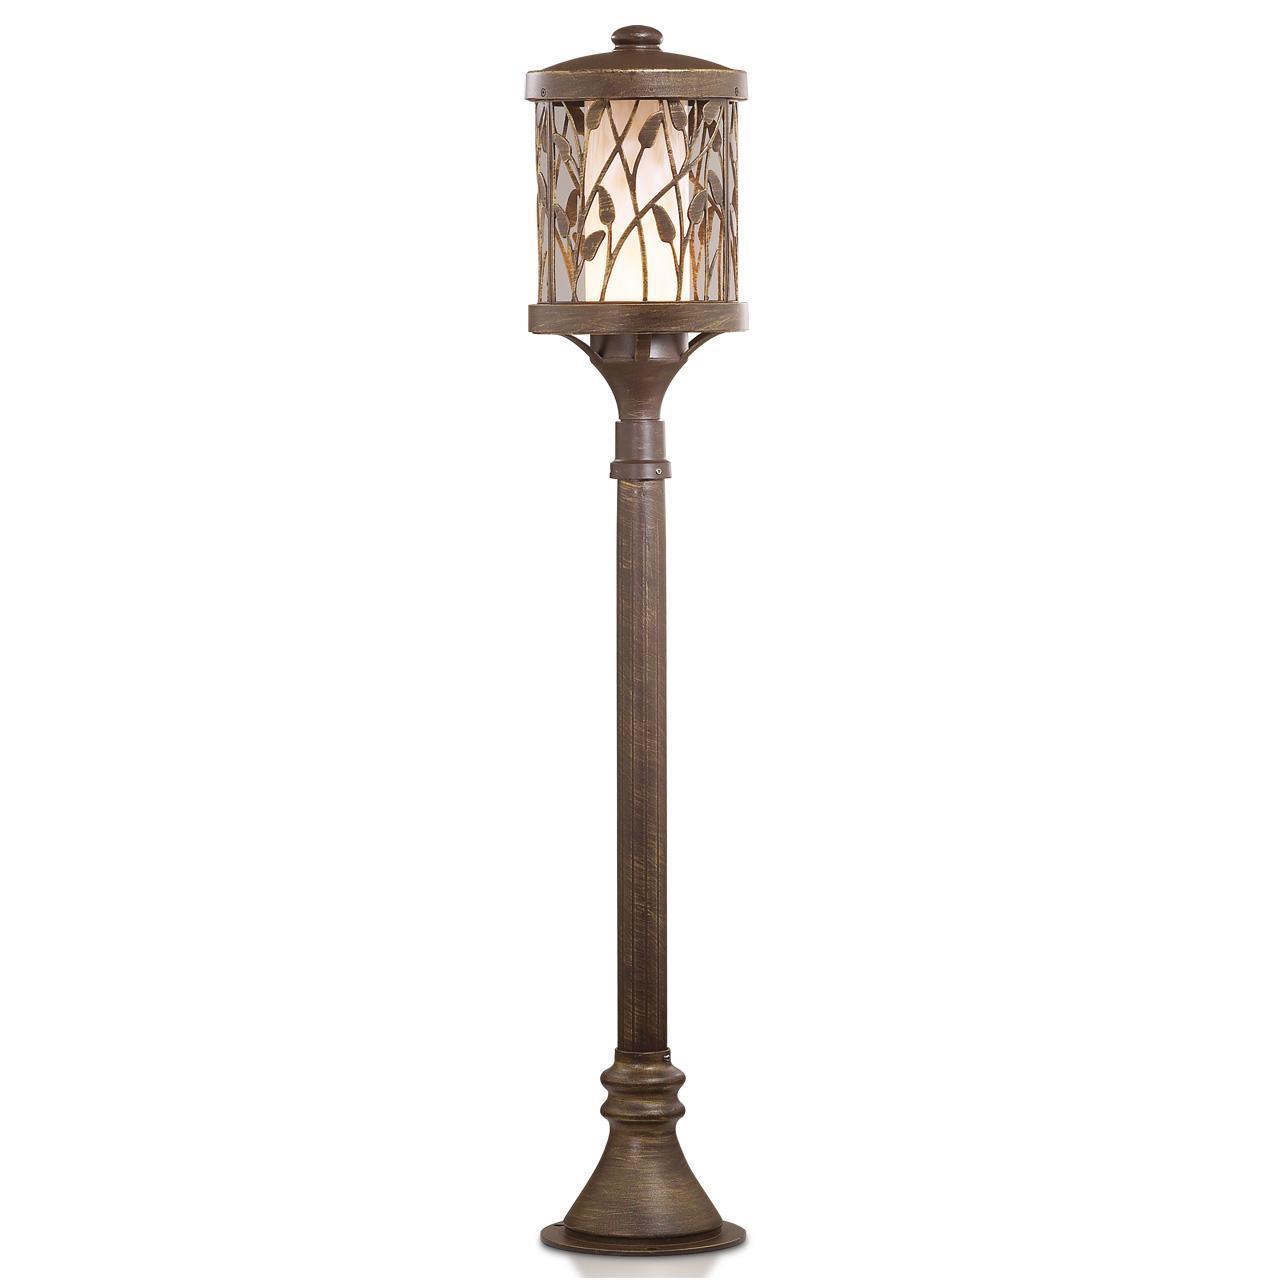 Уличный светильник Odeon Light Lagra 2287/1A odeon 2287 1w